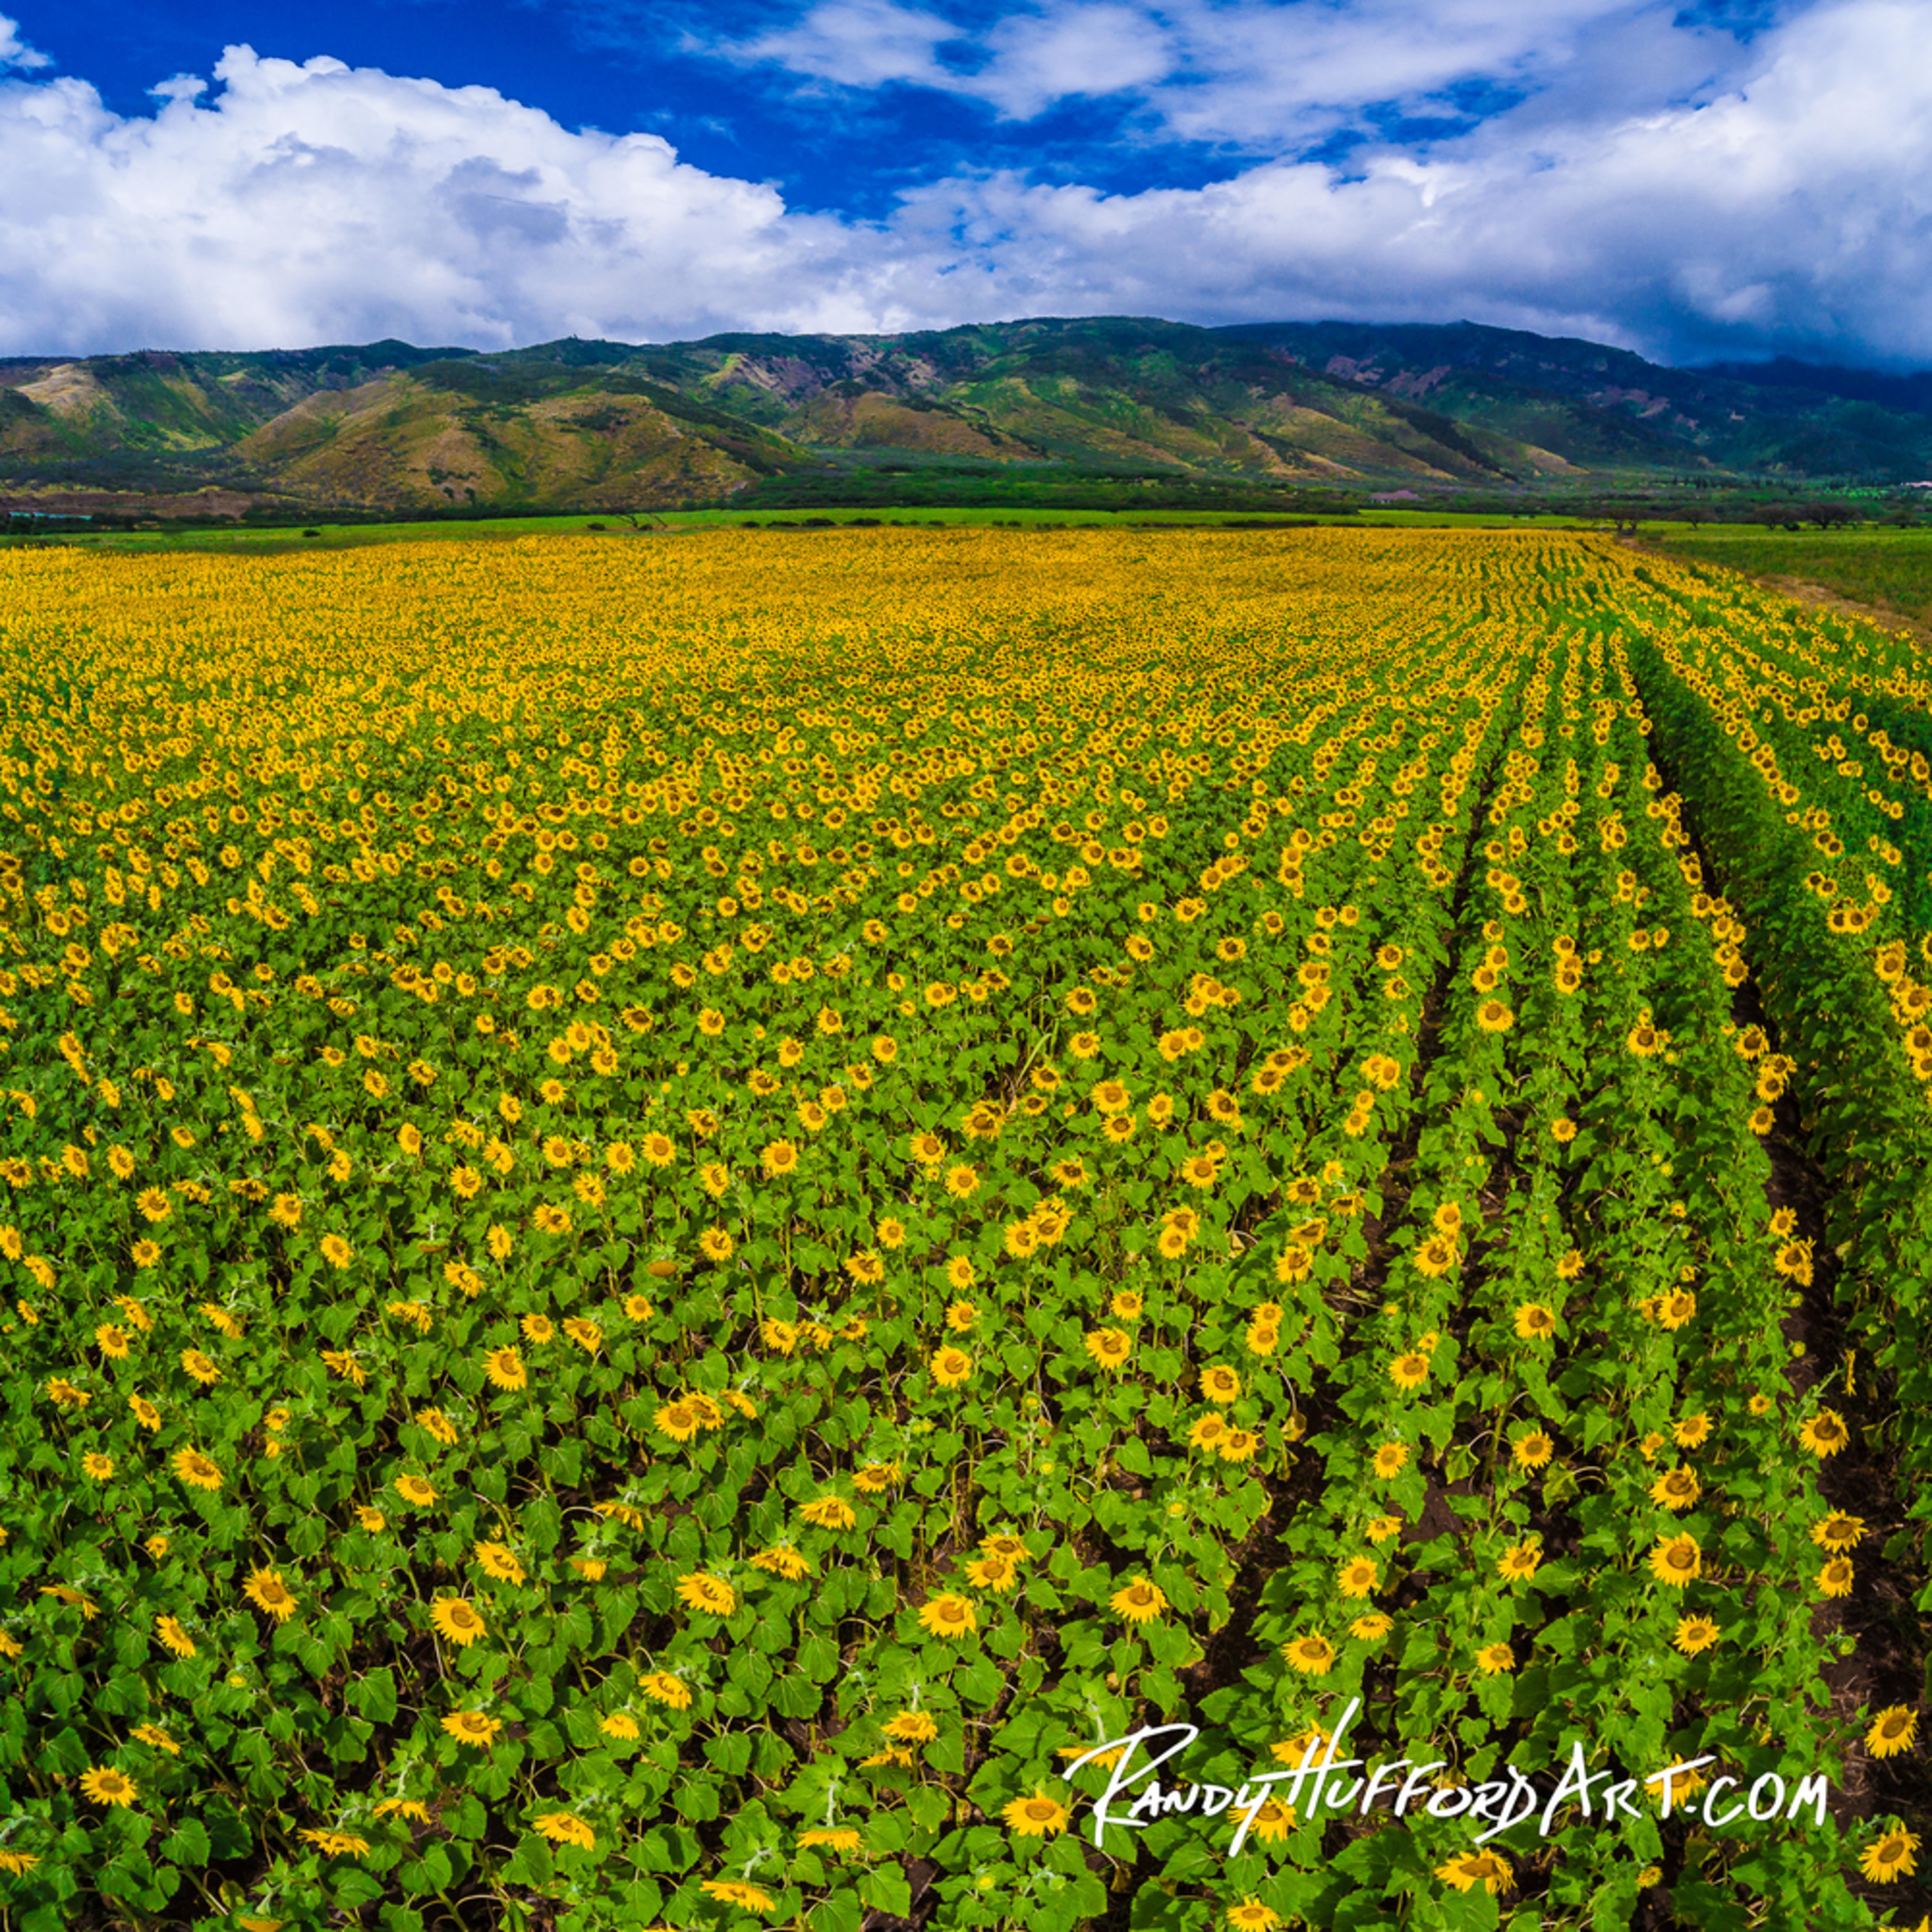 Maui sunflowerfields2dji 0965 pano s8jk8u